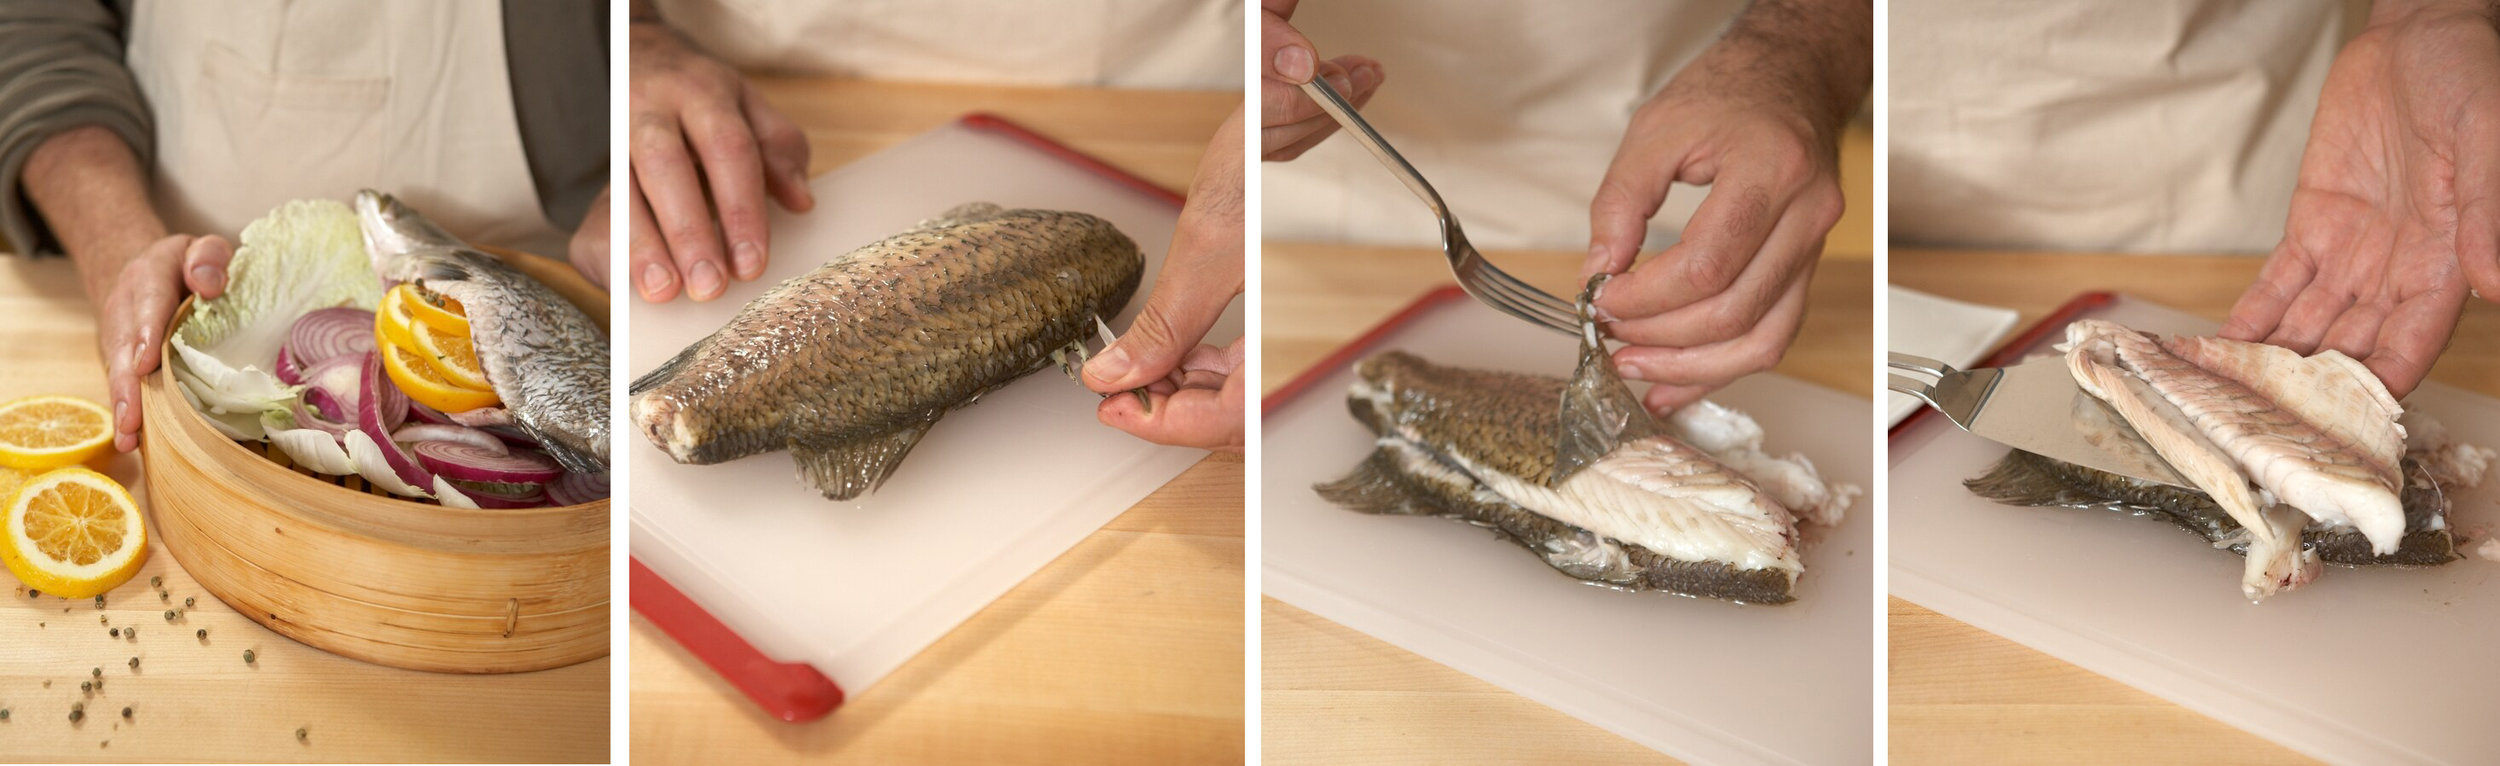 SteamedWholeFish.jpg